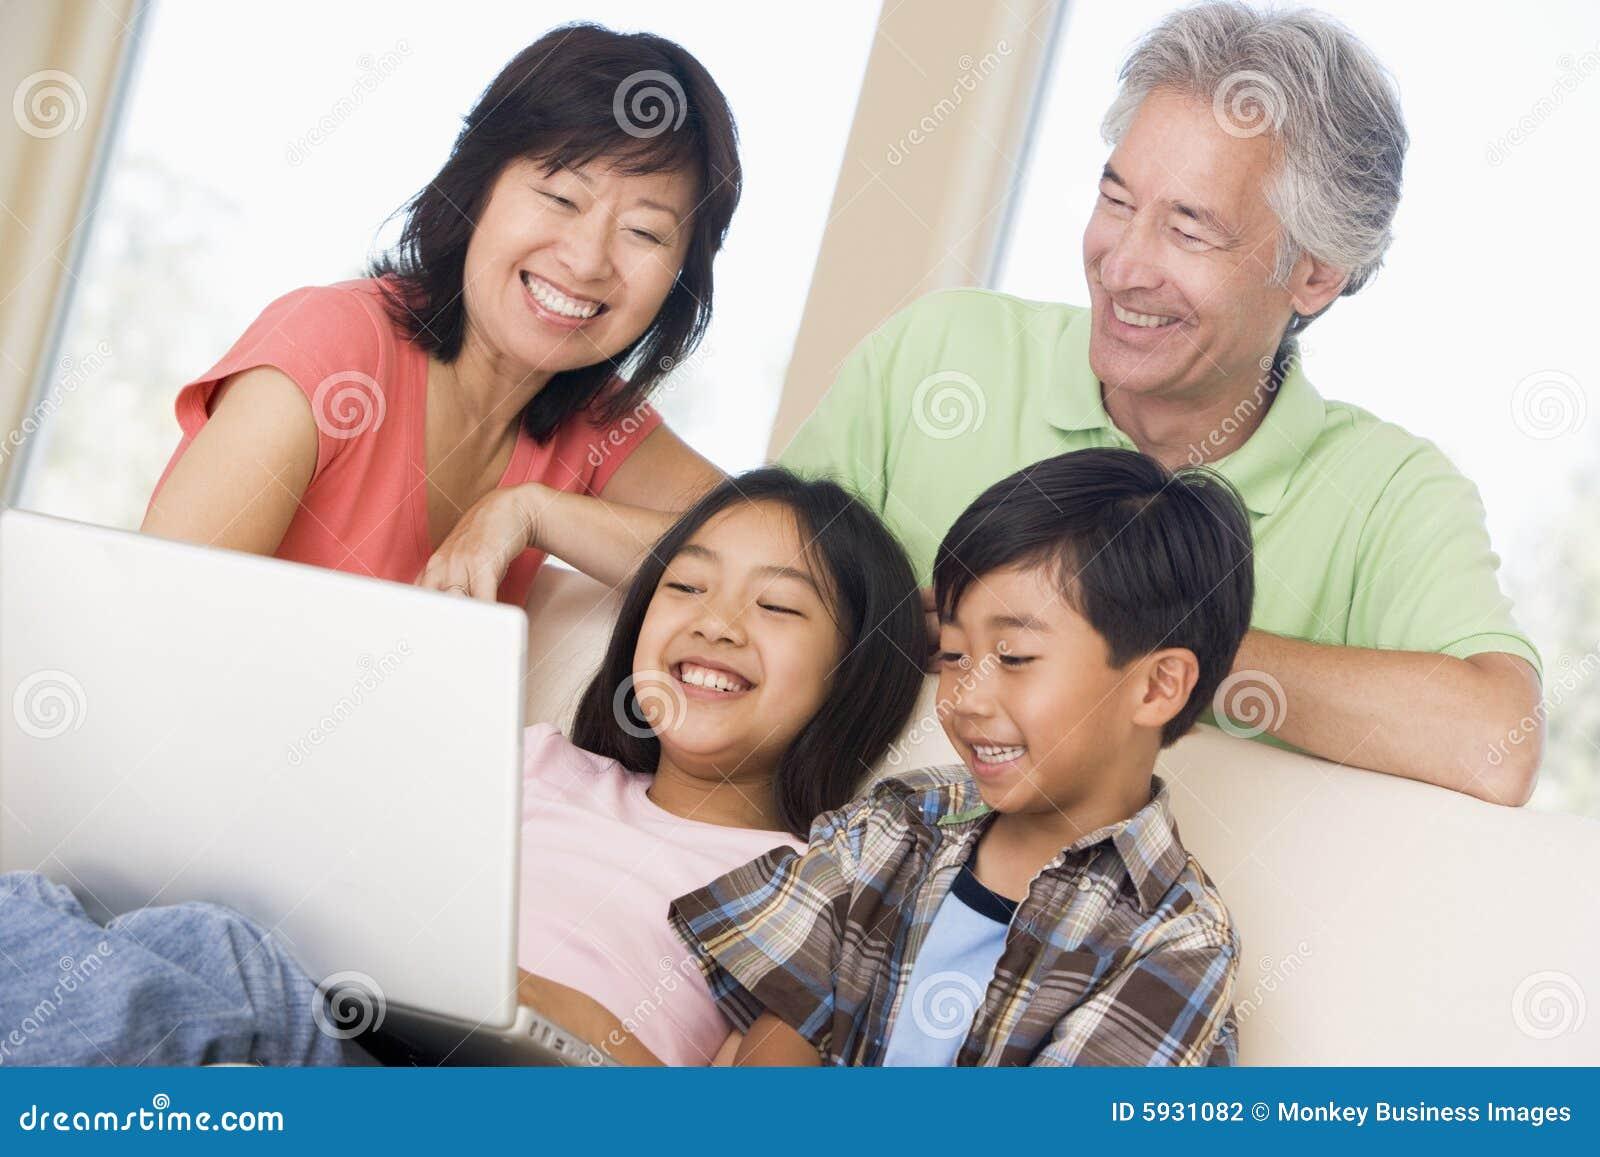 Children couple laptop room two